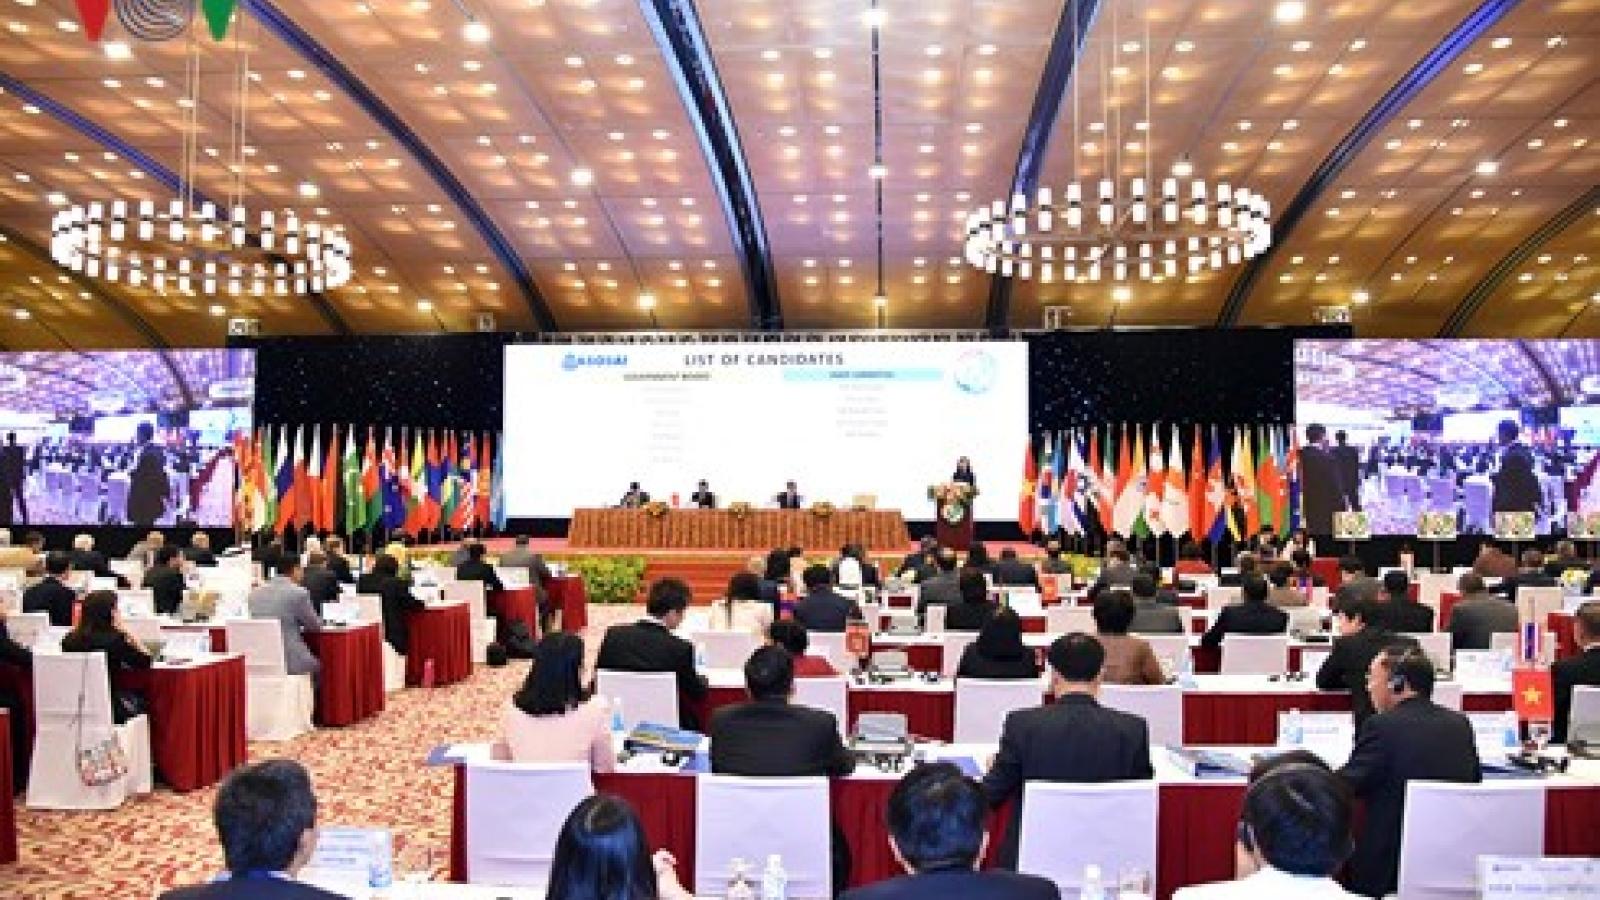 ASOSAI leaders: Hanoi Declaration notable achievement